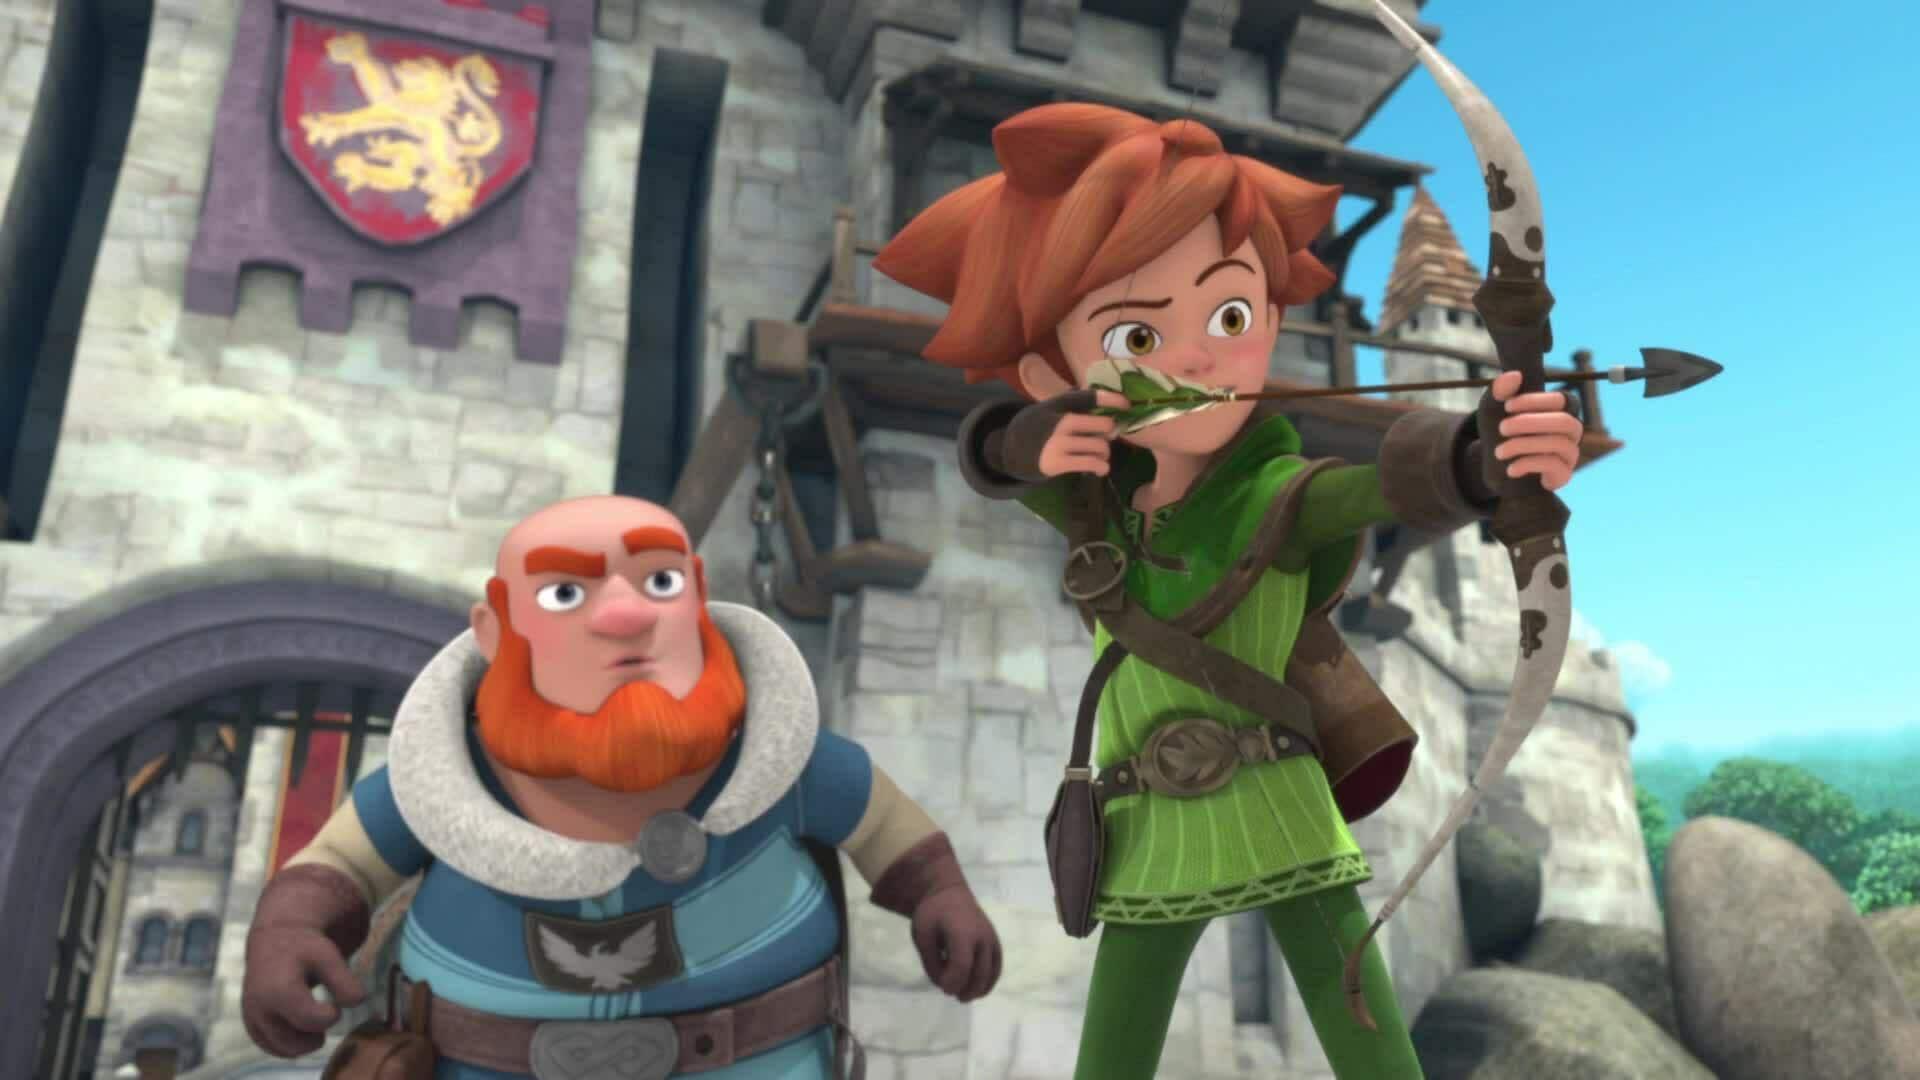 Nuori Robin Hood - Marian saa vallan